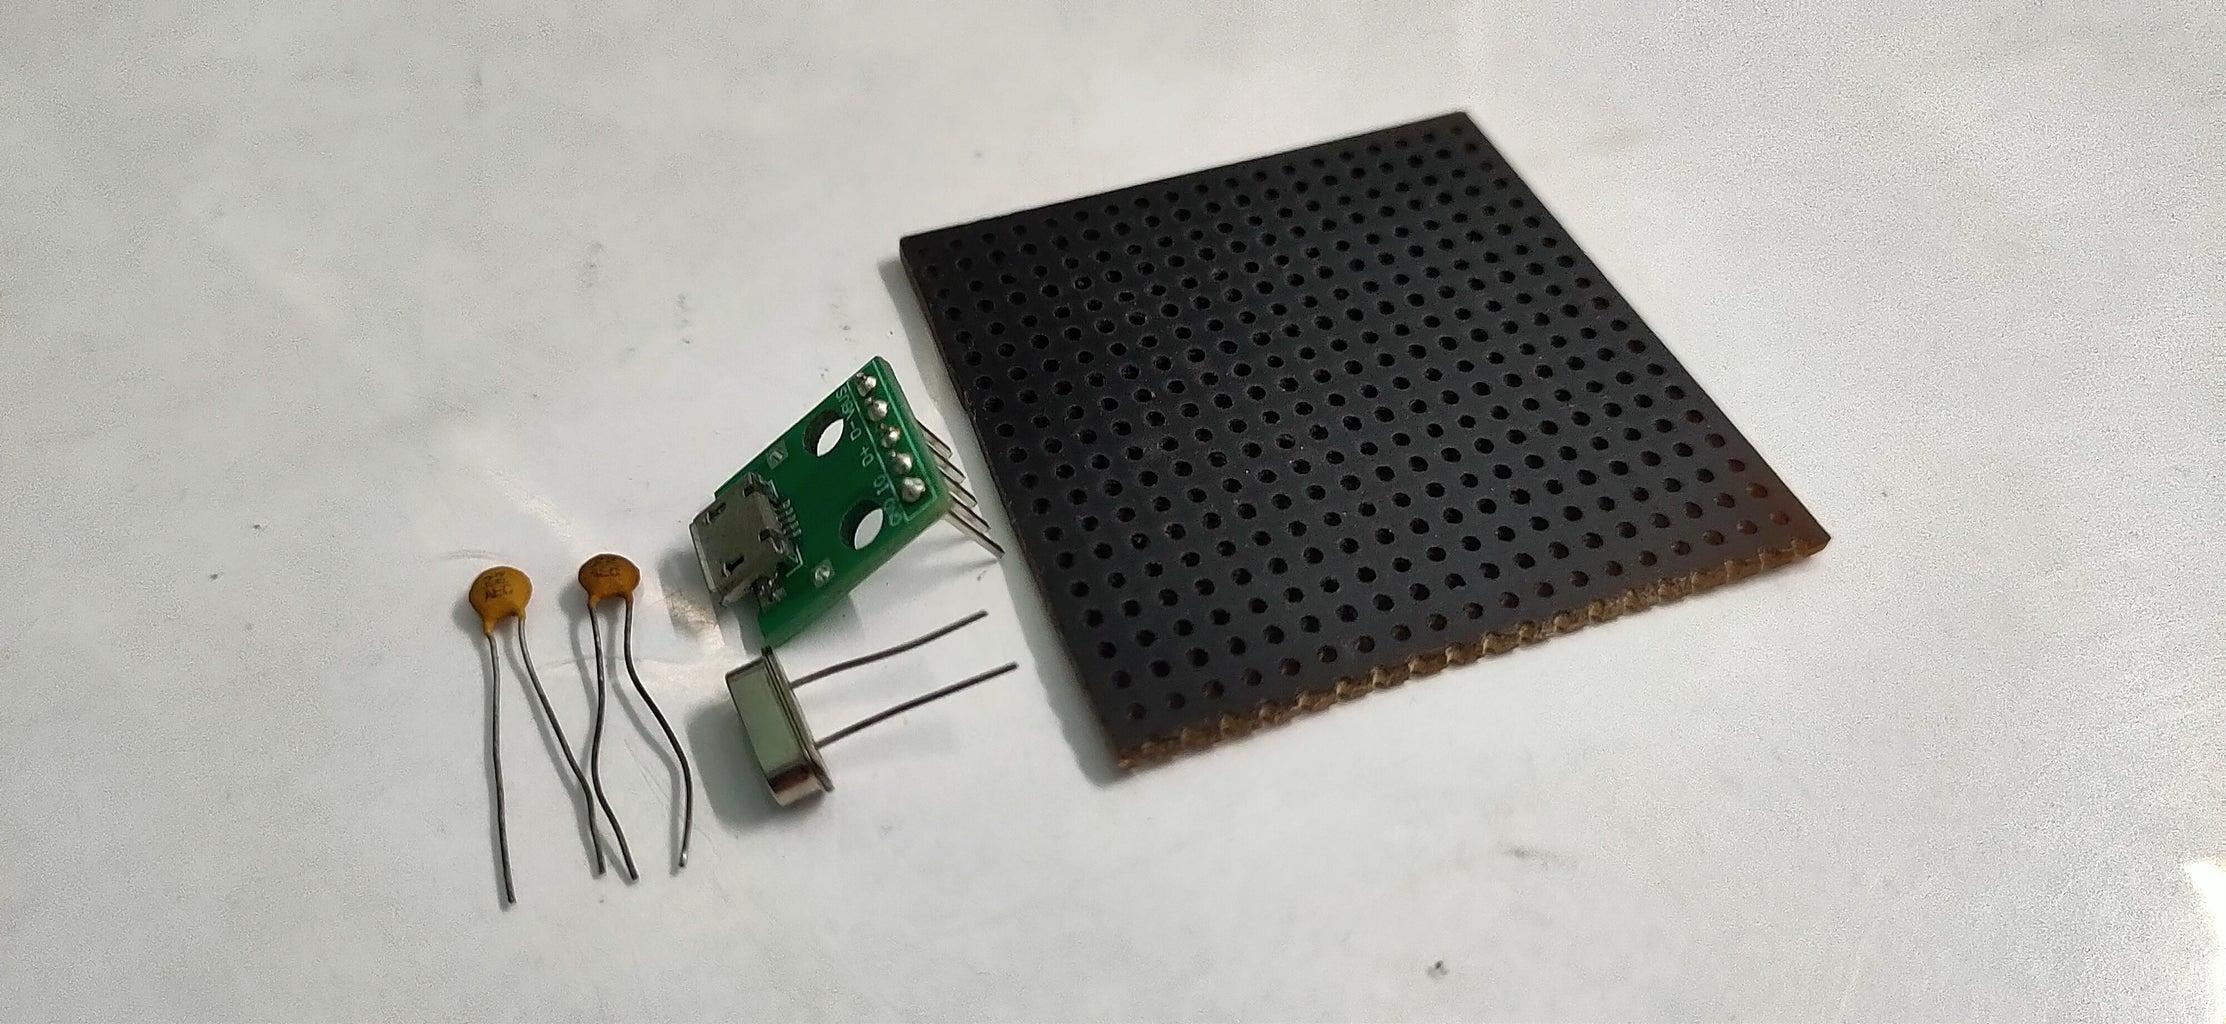 Adding Micro USB Breakout Board and Crystal Oscillator